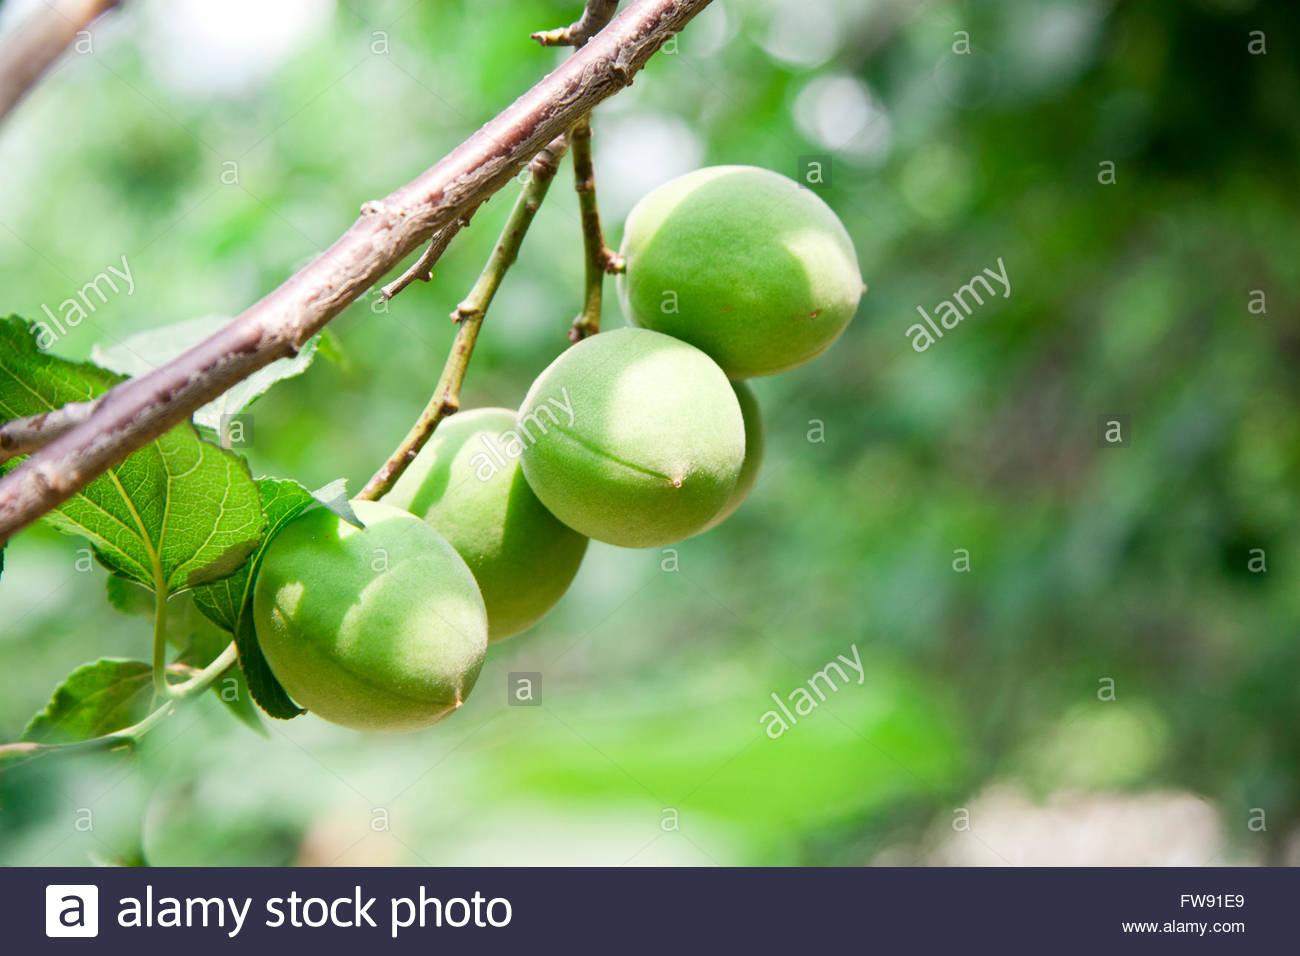 Japanese apricot - Stock Image